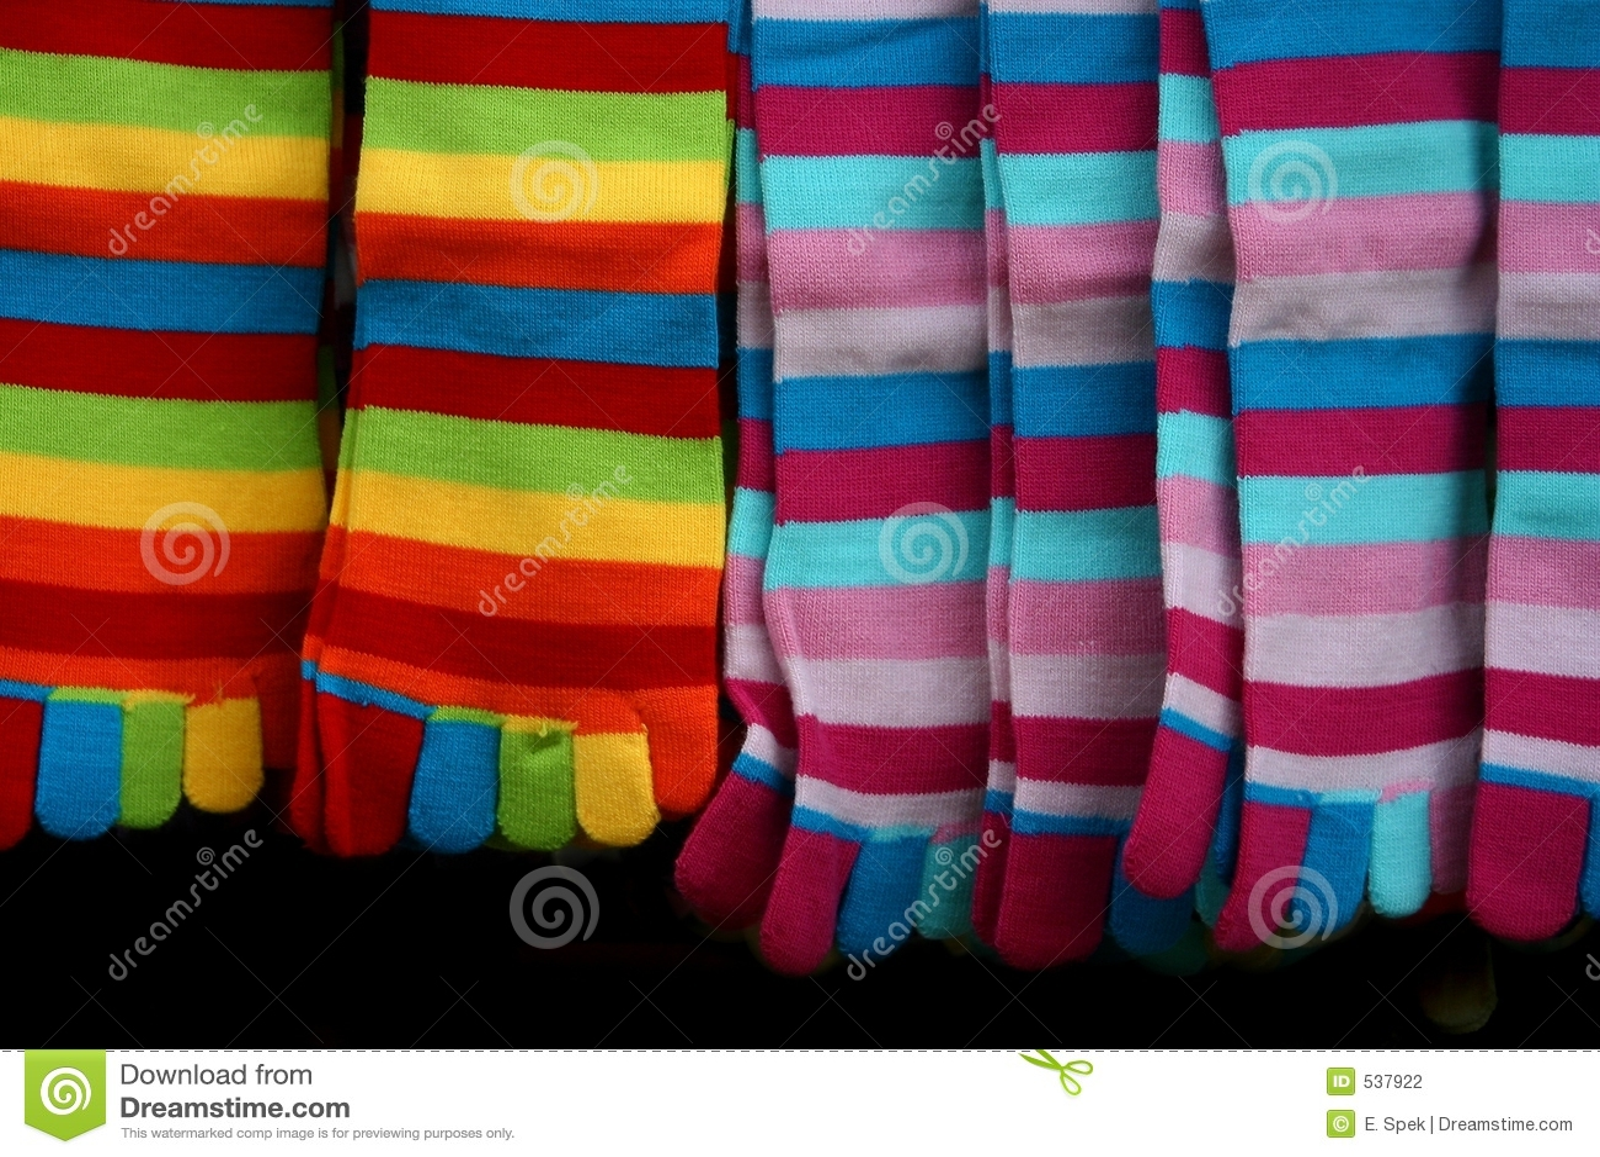 Download 镶边的五颜六色的袜子 库存照片. 图片 包括有 脚趾, 镶边, 袜子, 销售额, 五颜六色, 市场, 舒适, 温暖 - 537922